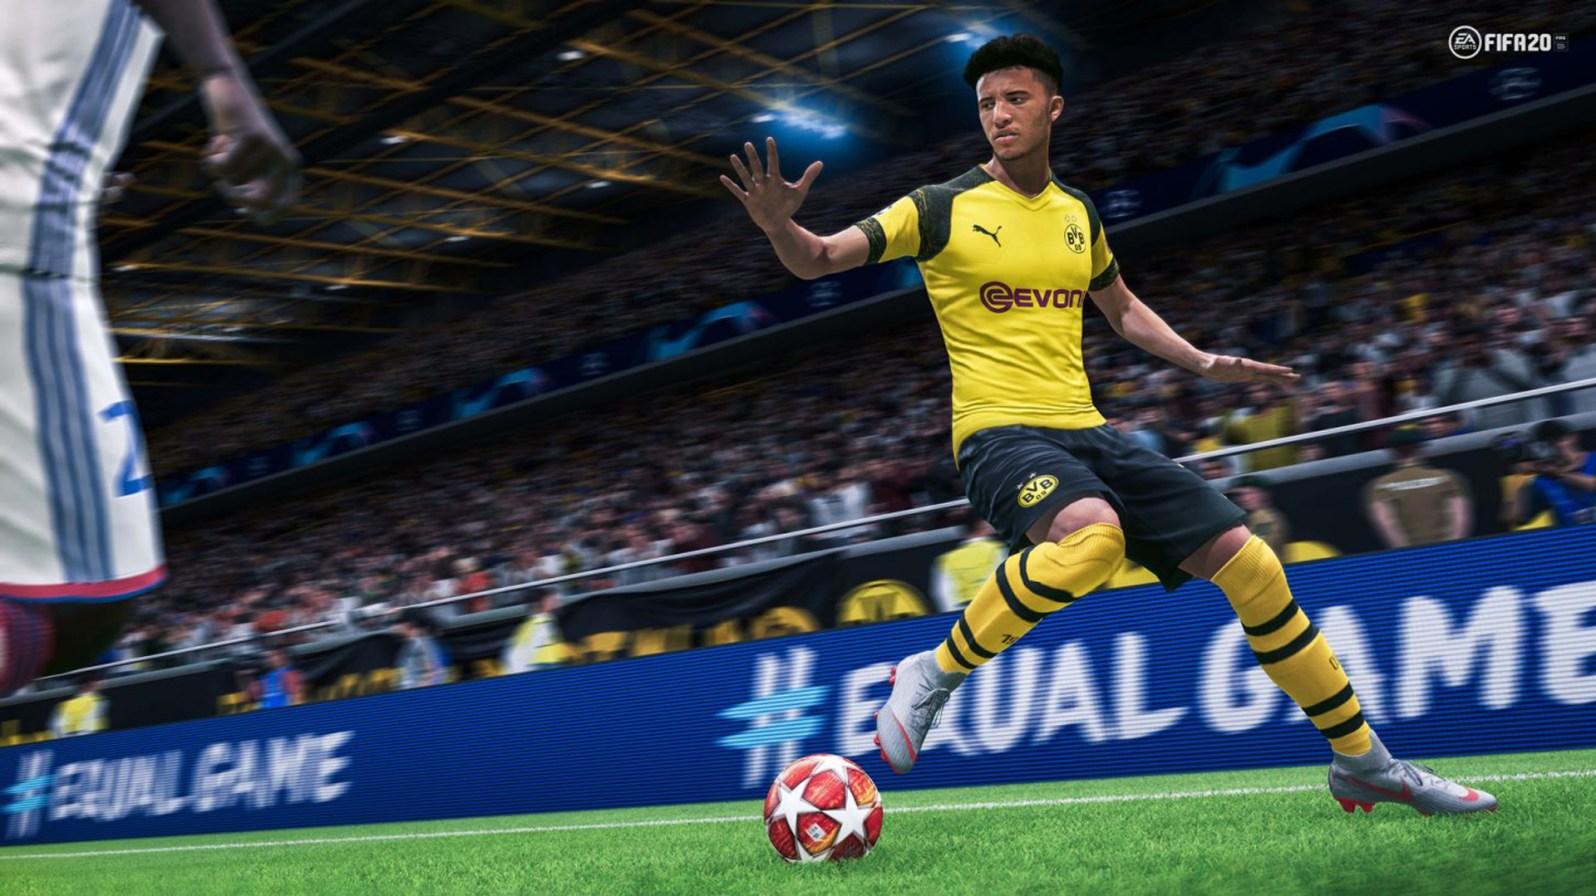 Quelle: Electronic Arts - FIFA 20